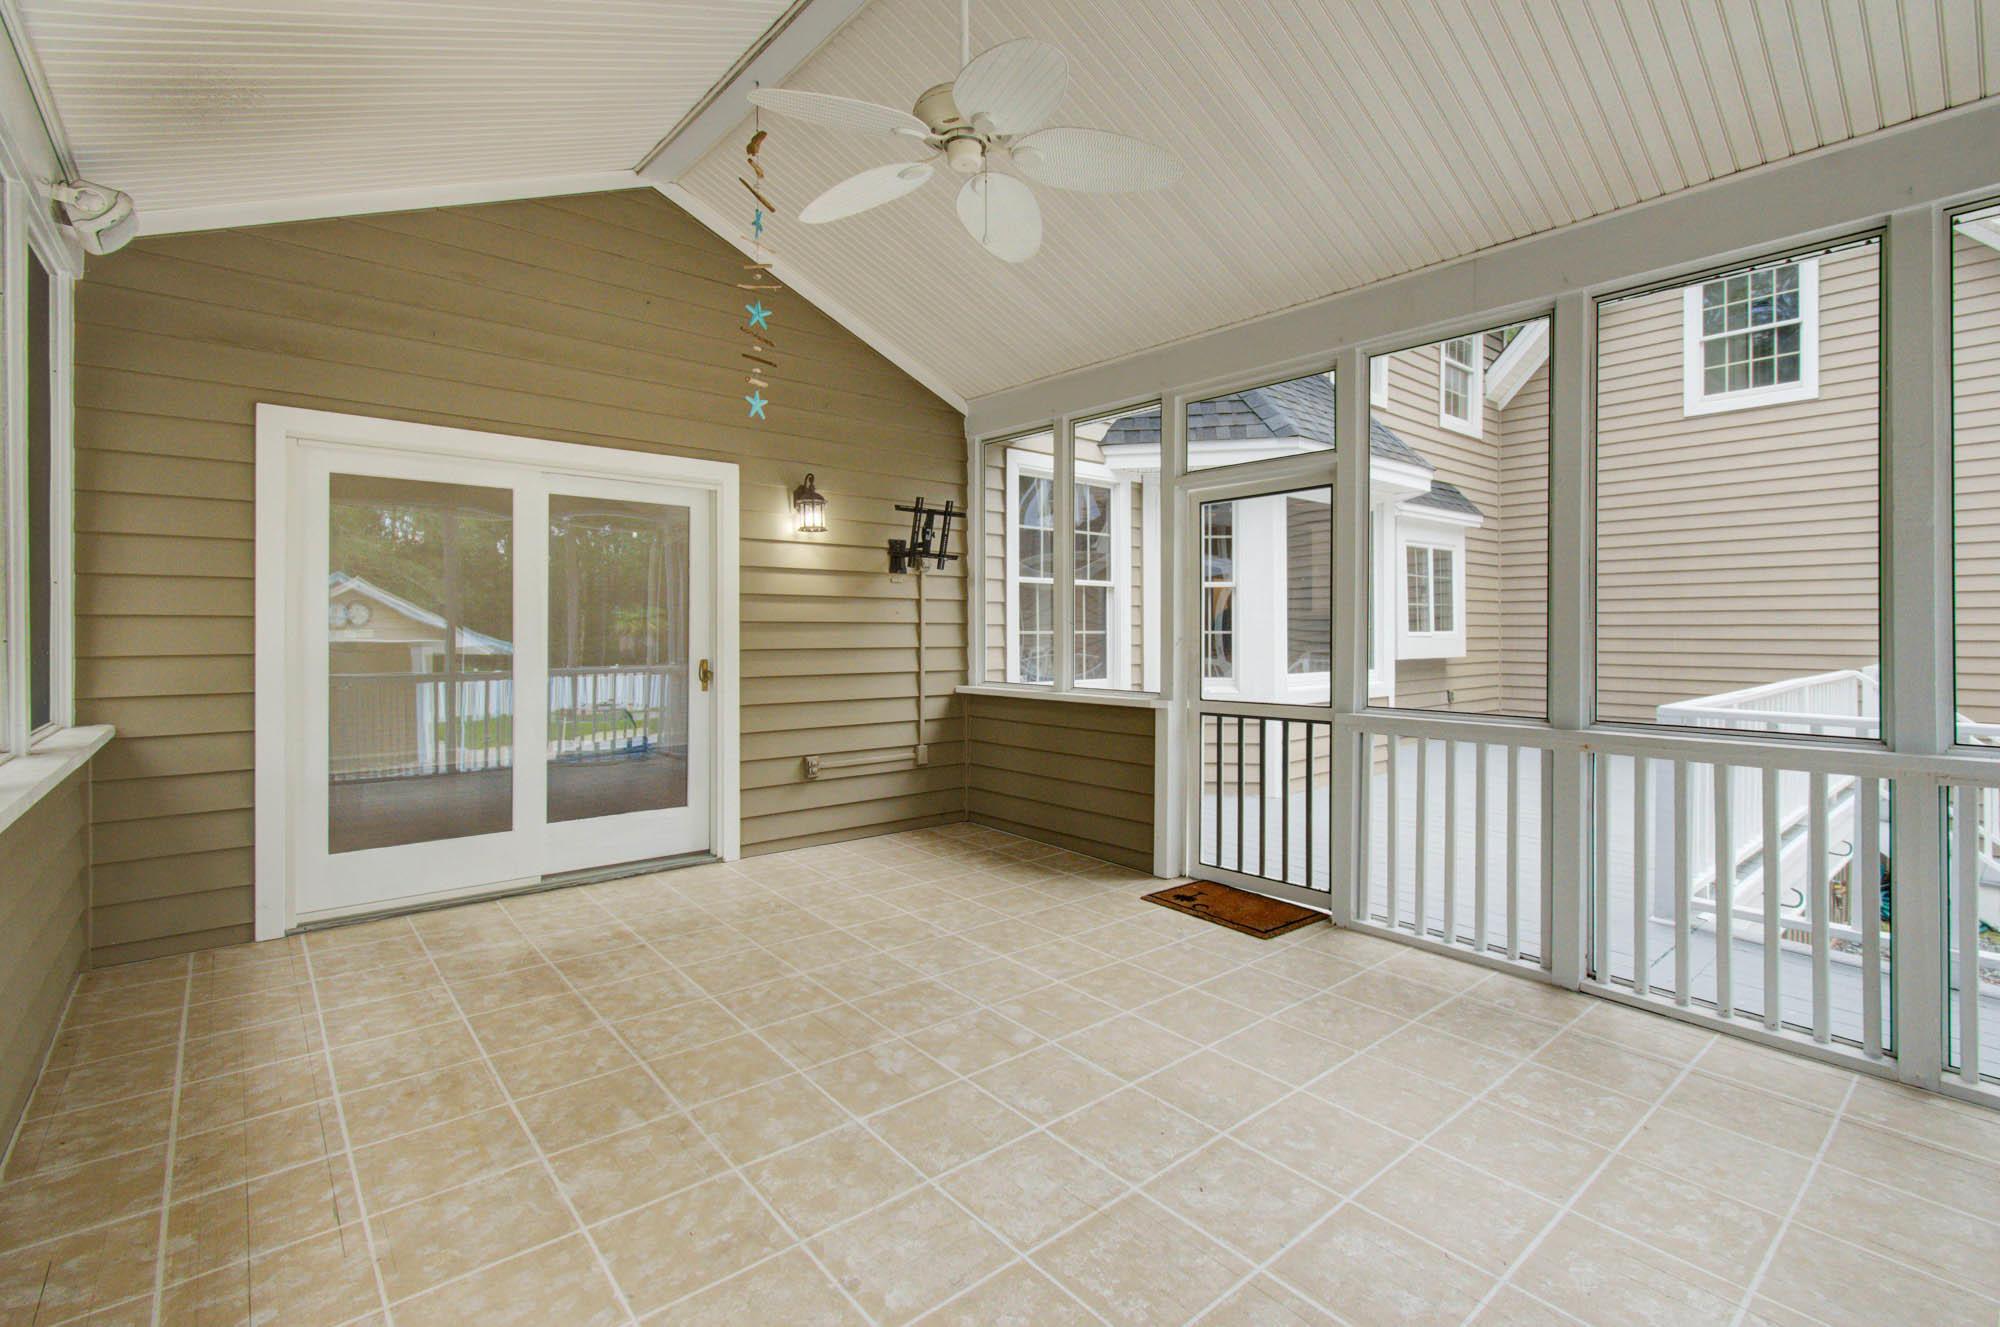 Dunes West Homes For Sale - 3515 Colonel Vanderhorst, Mount Pleasant, SC - 19